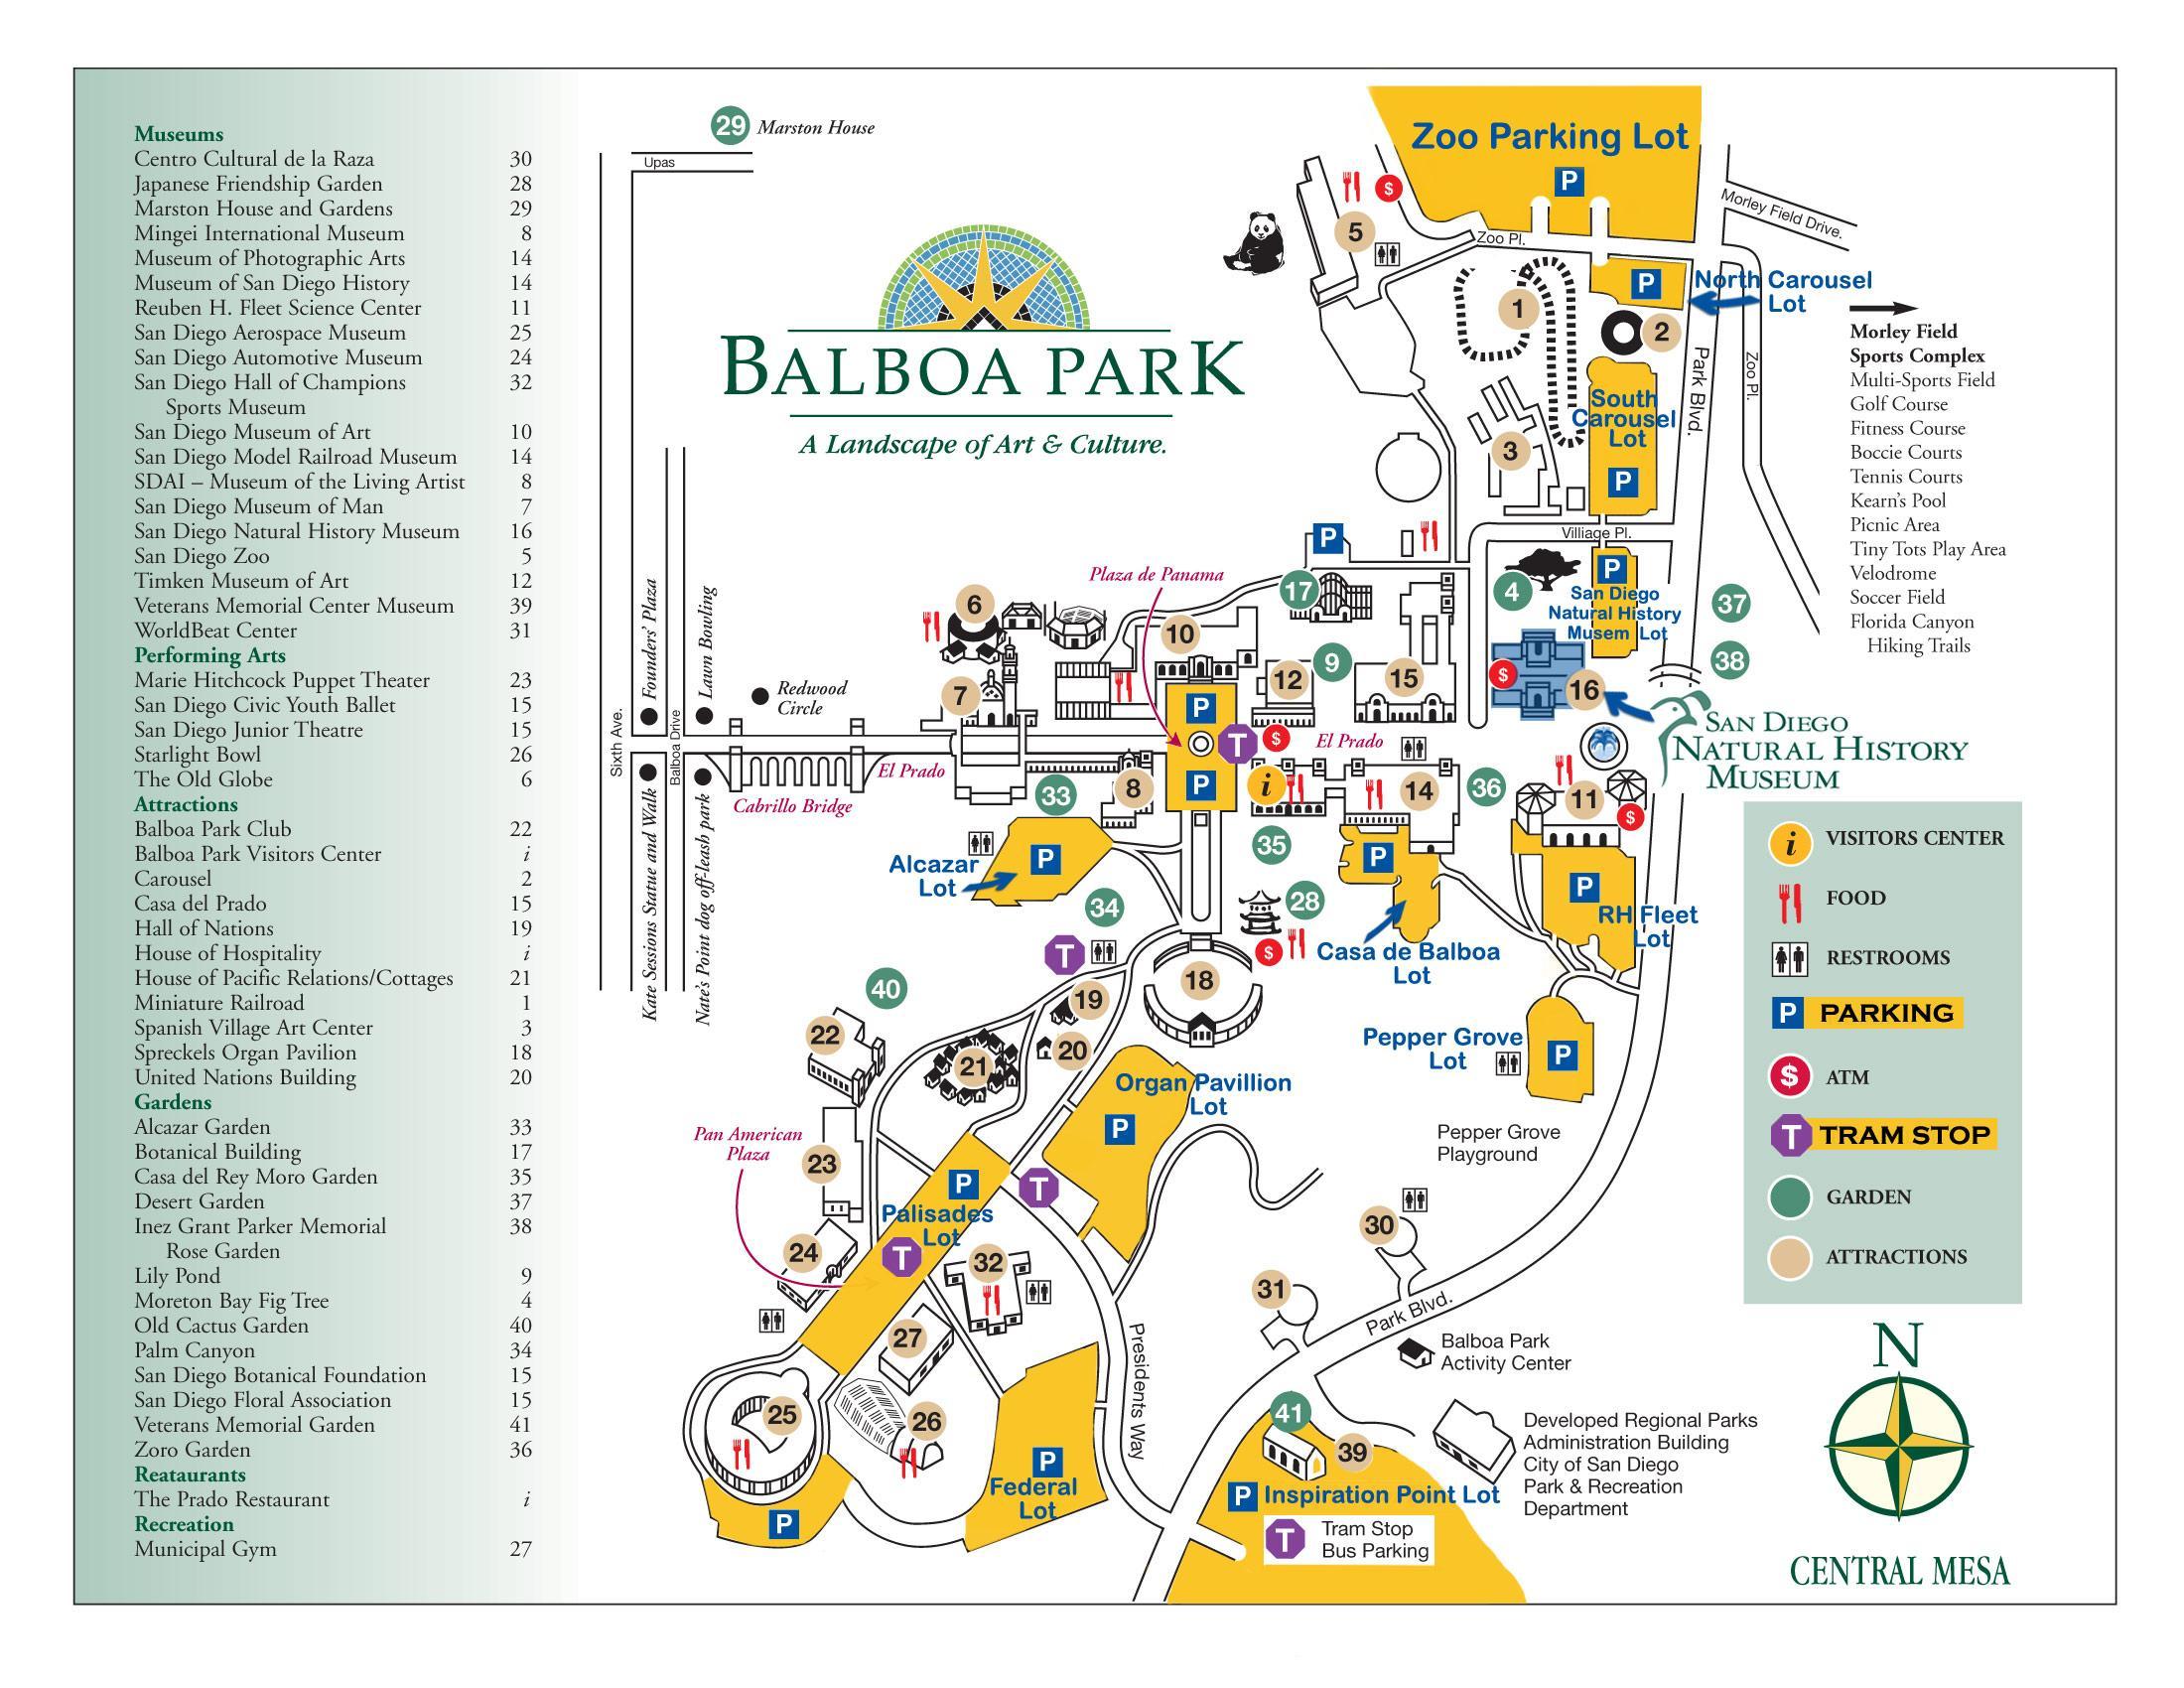 Balboa Park Map - Map Of Balboa Park San Diego (California - Usa) - Map Of Balboa Park San Diego California